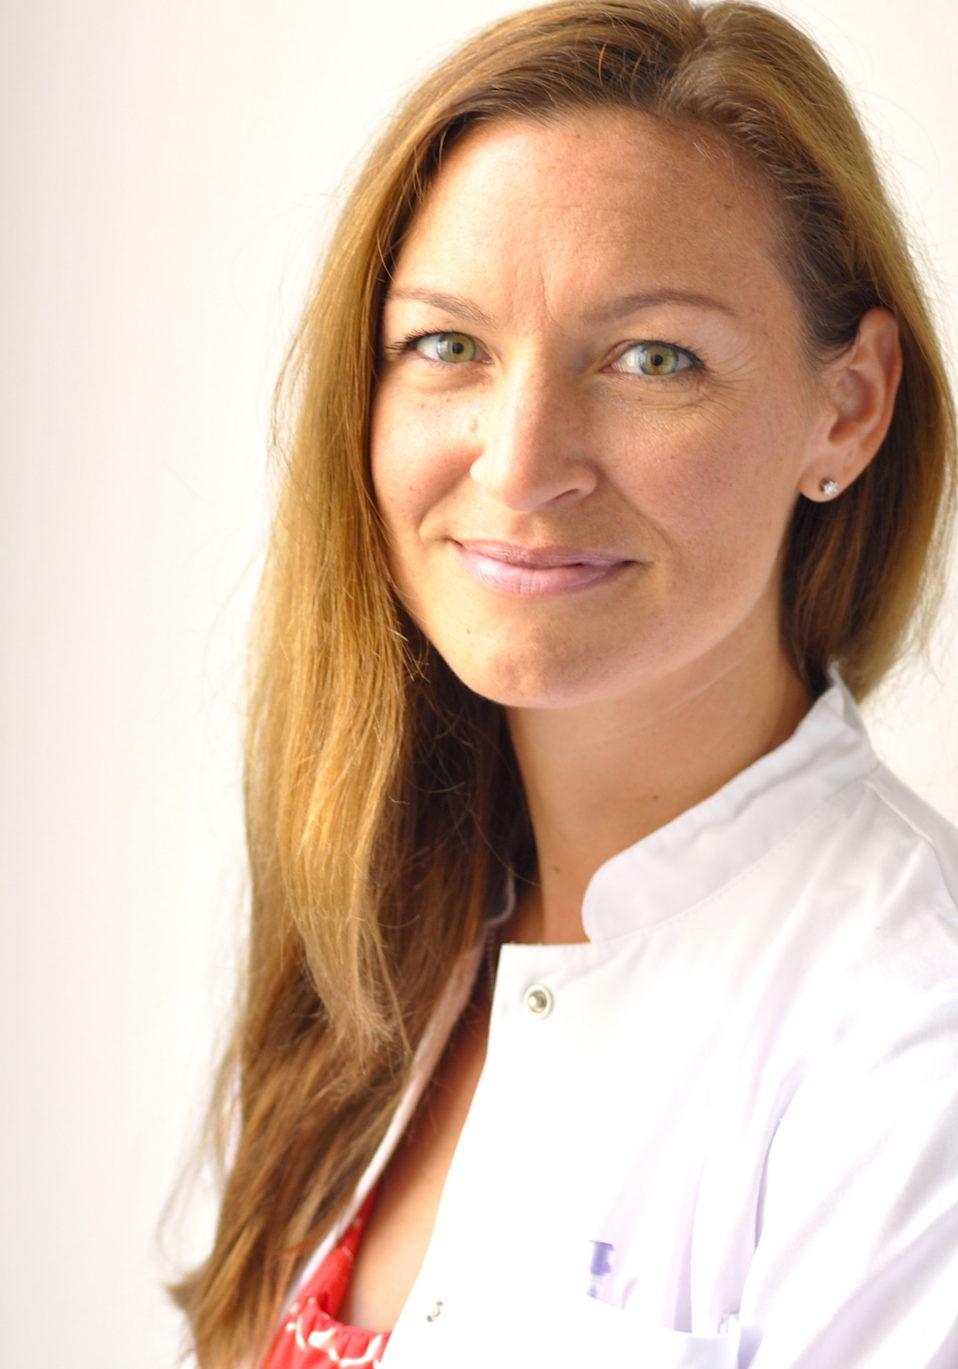 Experteninterview mit Dr. med. Katharina Ottes